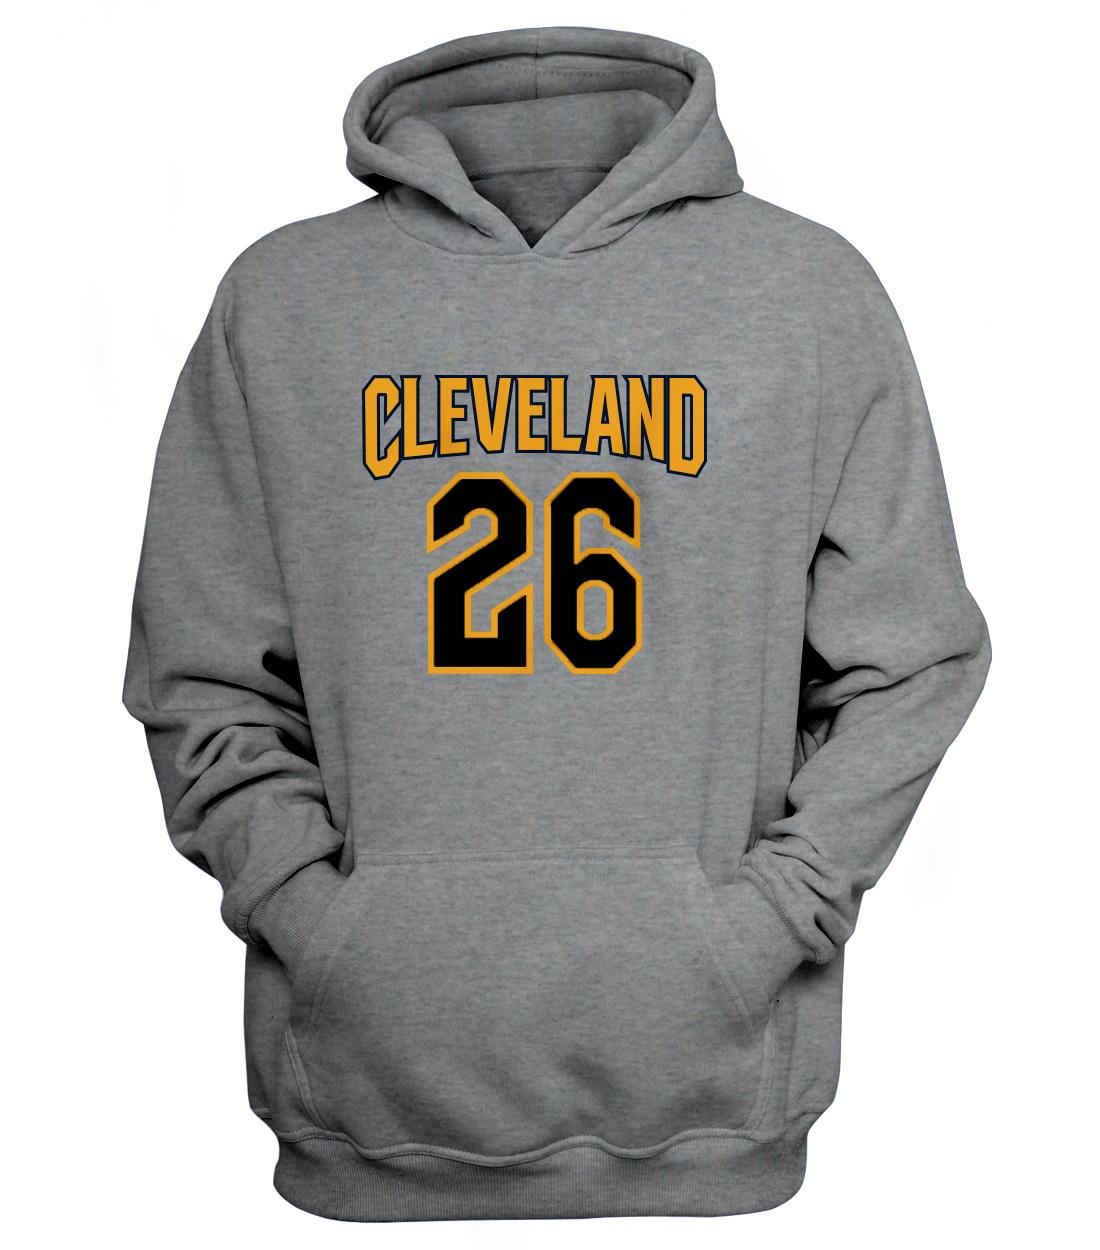 Cleveland Cavaliers Cleveland Kyle Korver Hoodie (HD-grey-60-PLYR-CLE-KORVER.FRM)